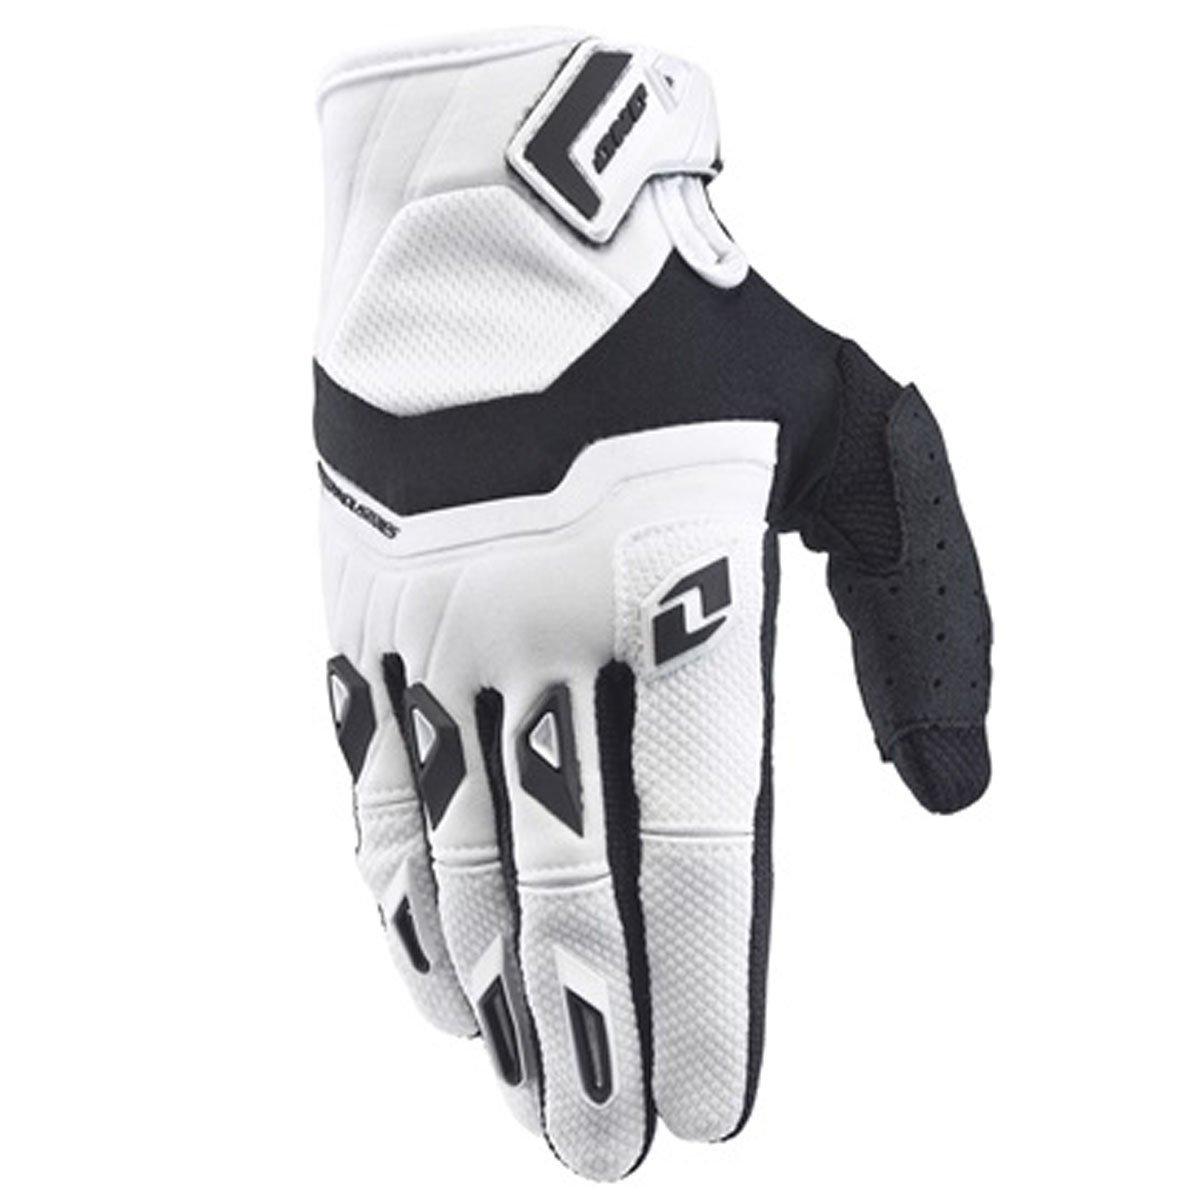 White//Black, XX-Large One Industries Gamma Jockey Jersey